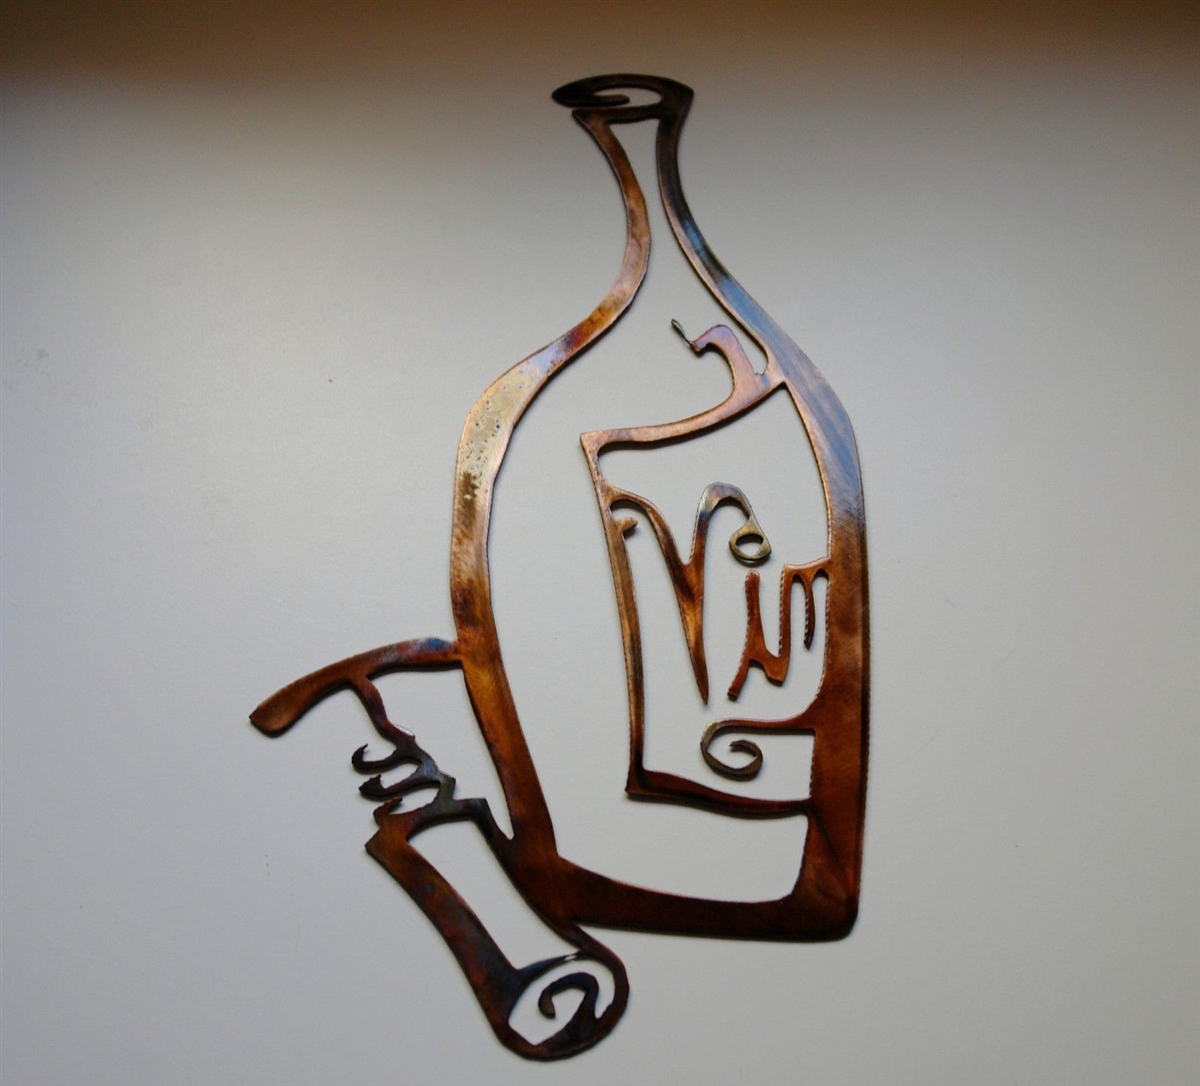 Wine Bottle Wall Decor vino! metal wall art decor, wine bottle and opener copper & bronze